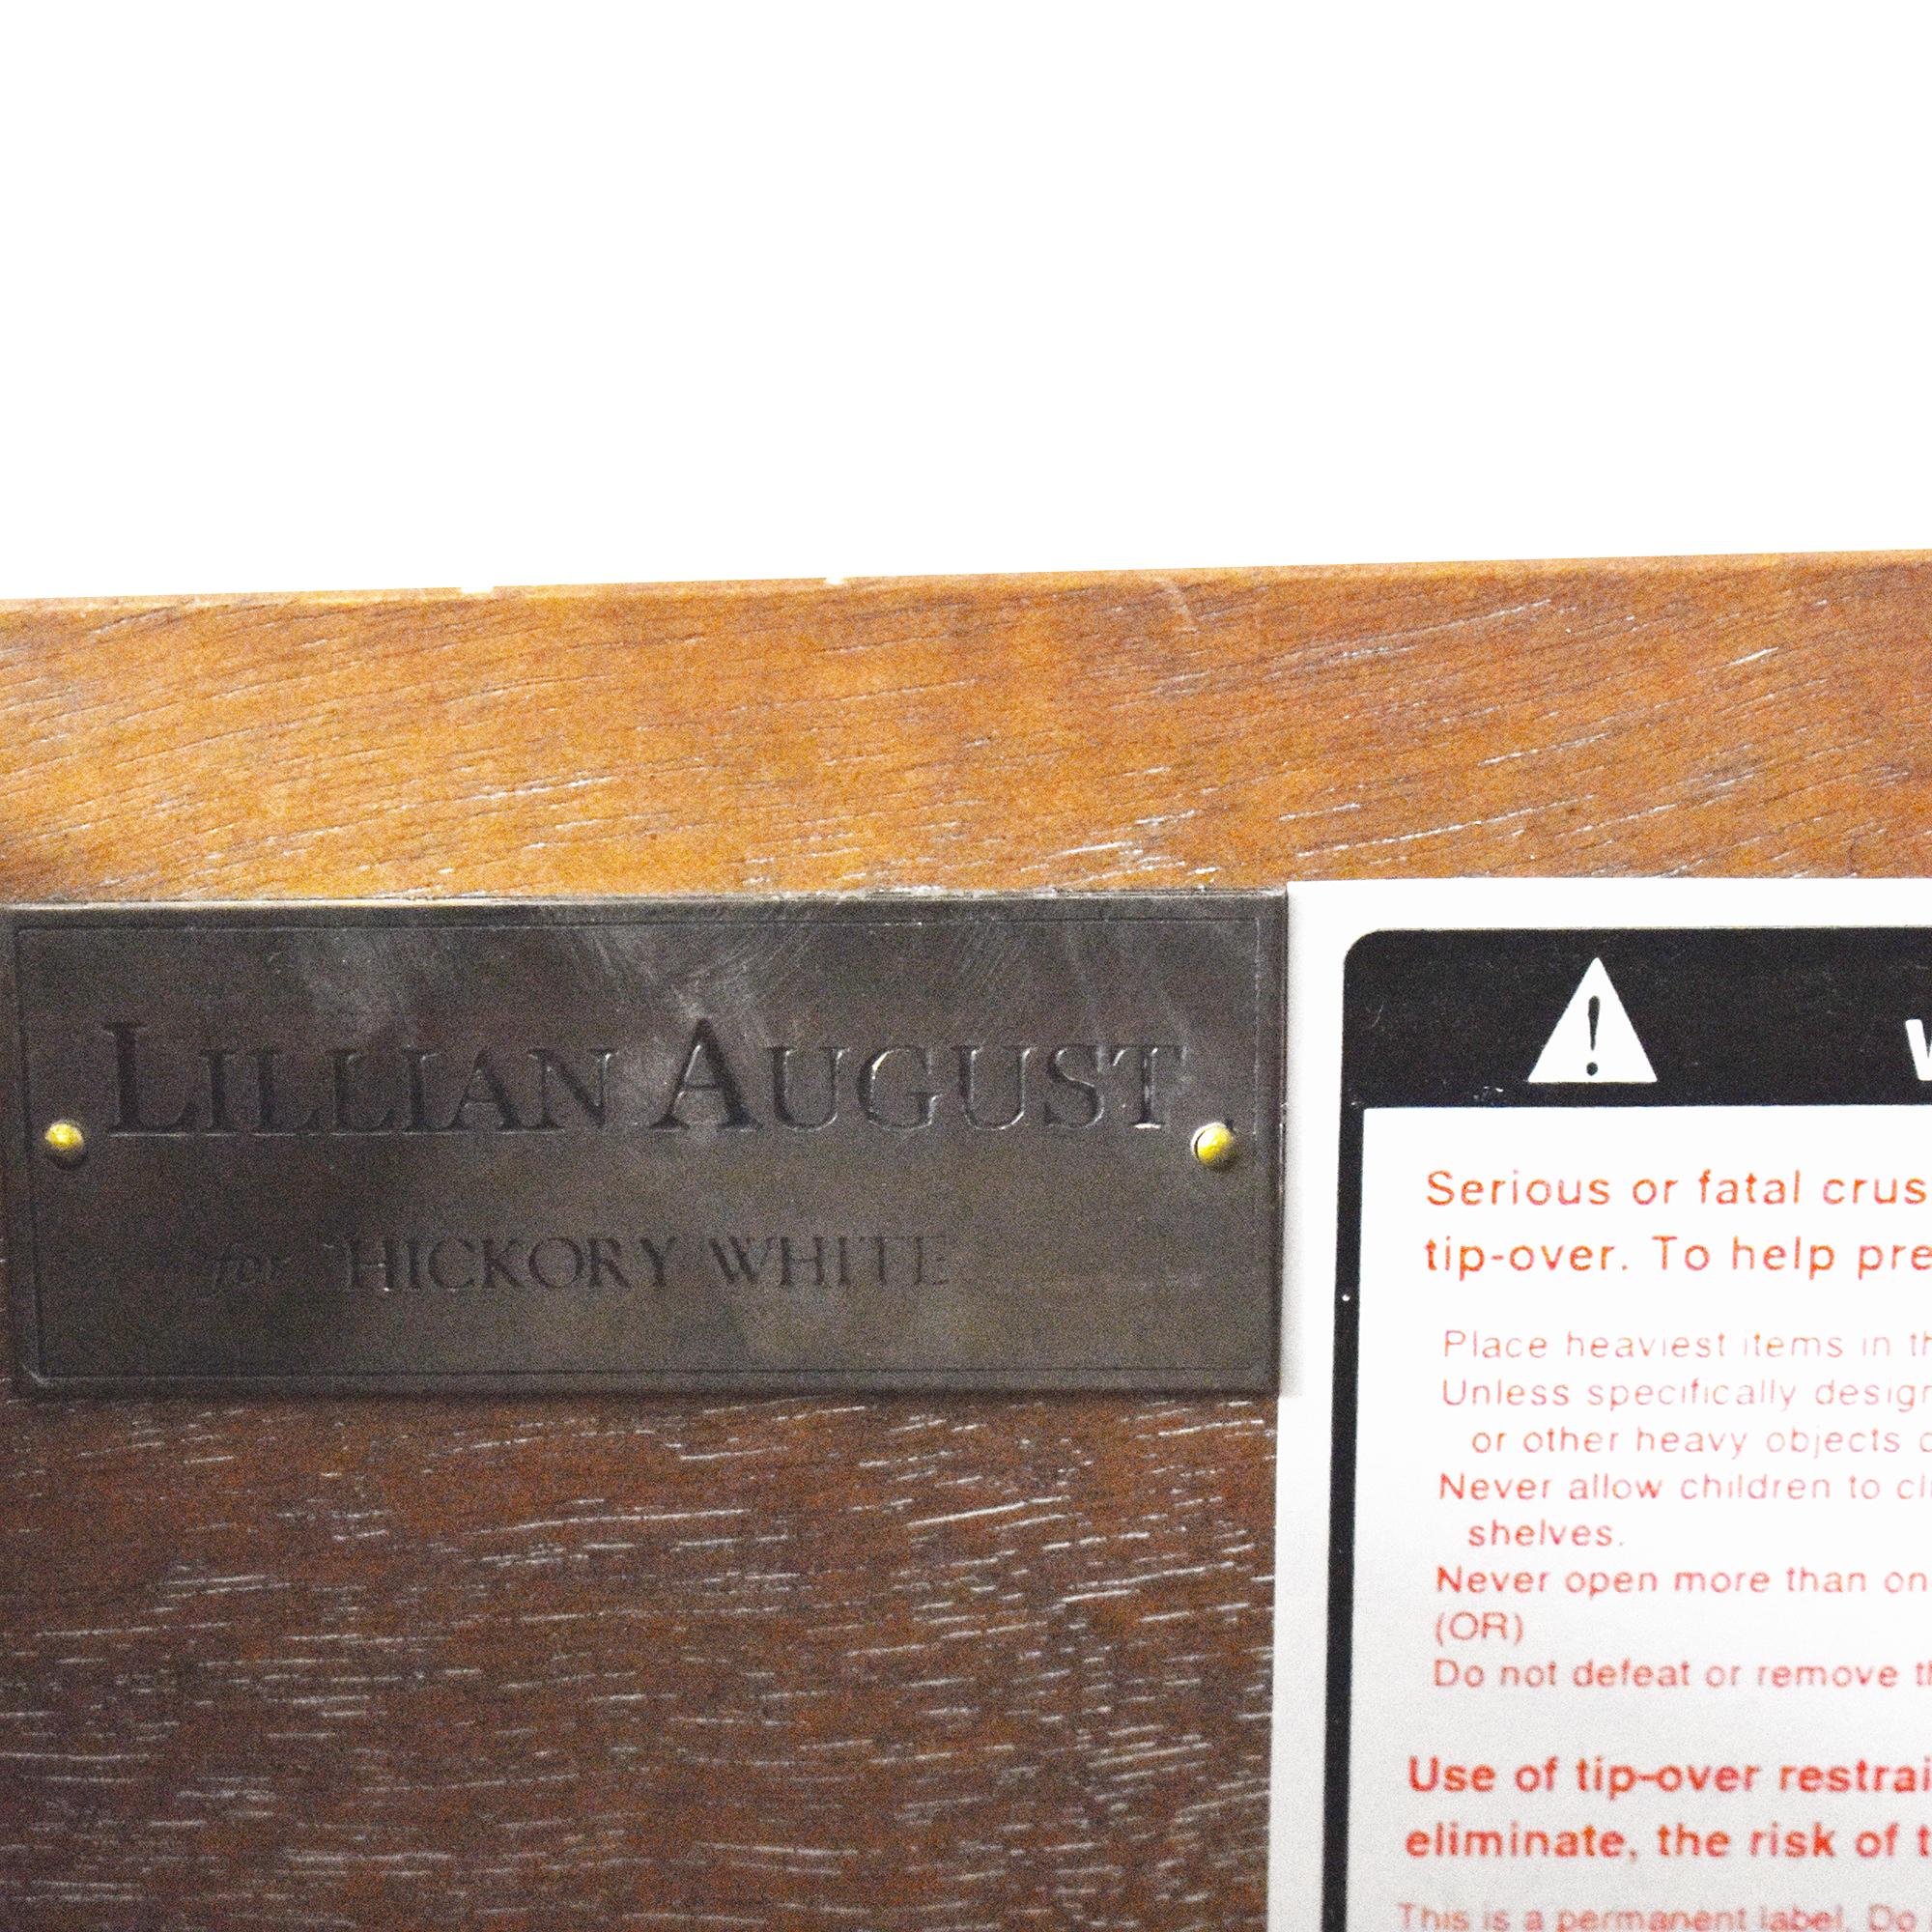 Lillian August Hickory White for Lillian August Breuer Etagere pa